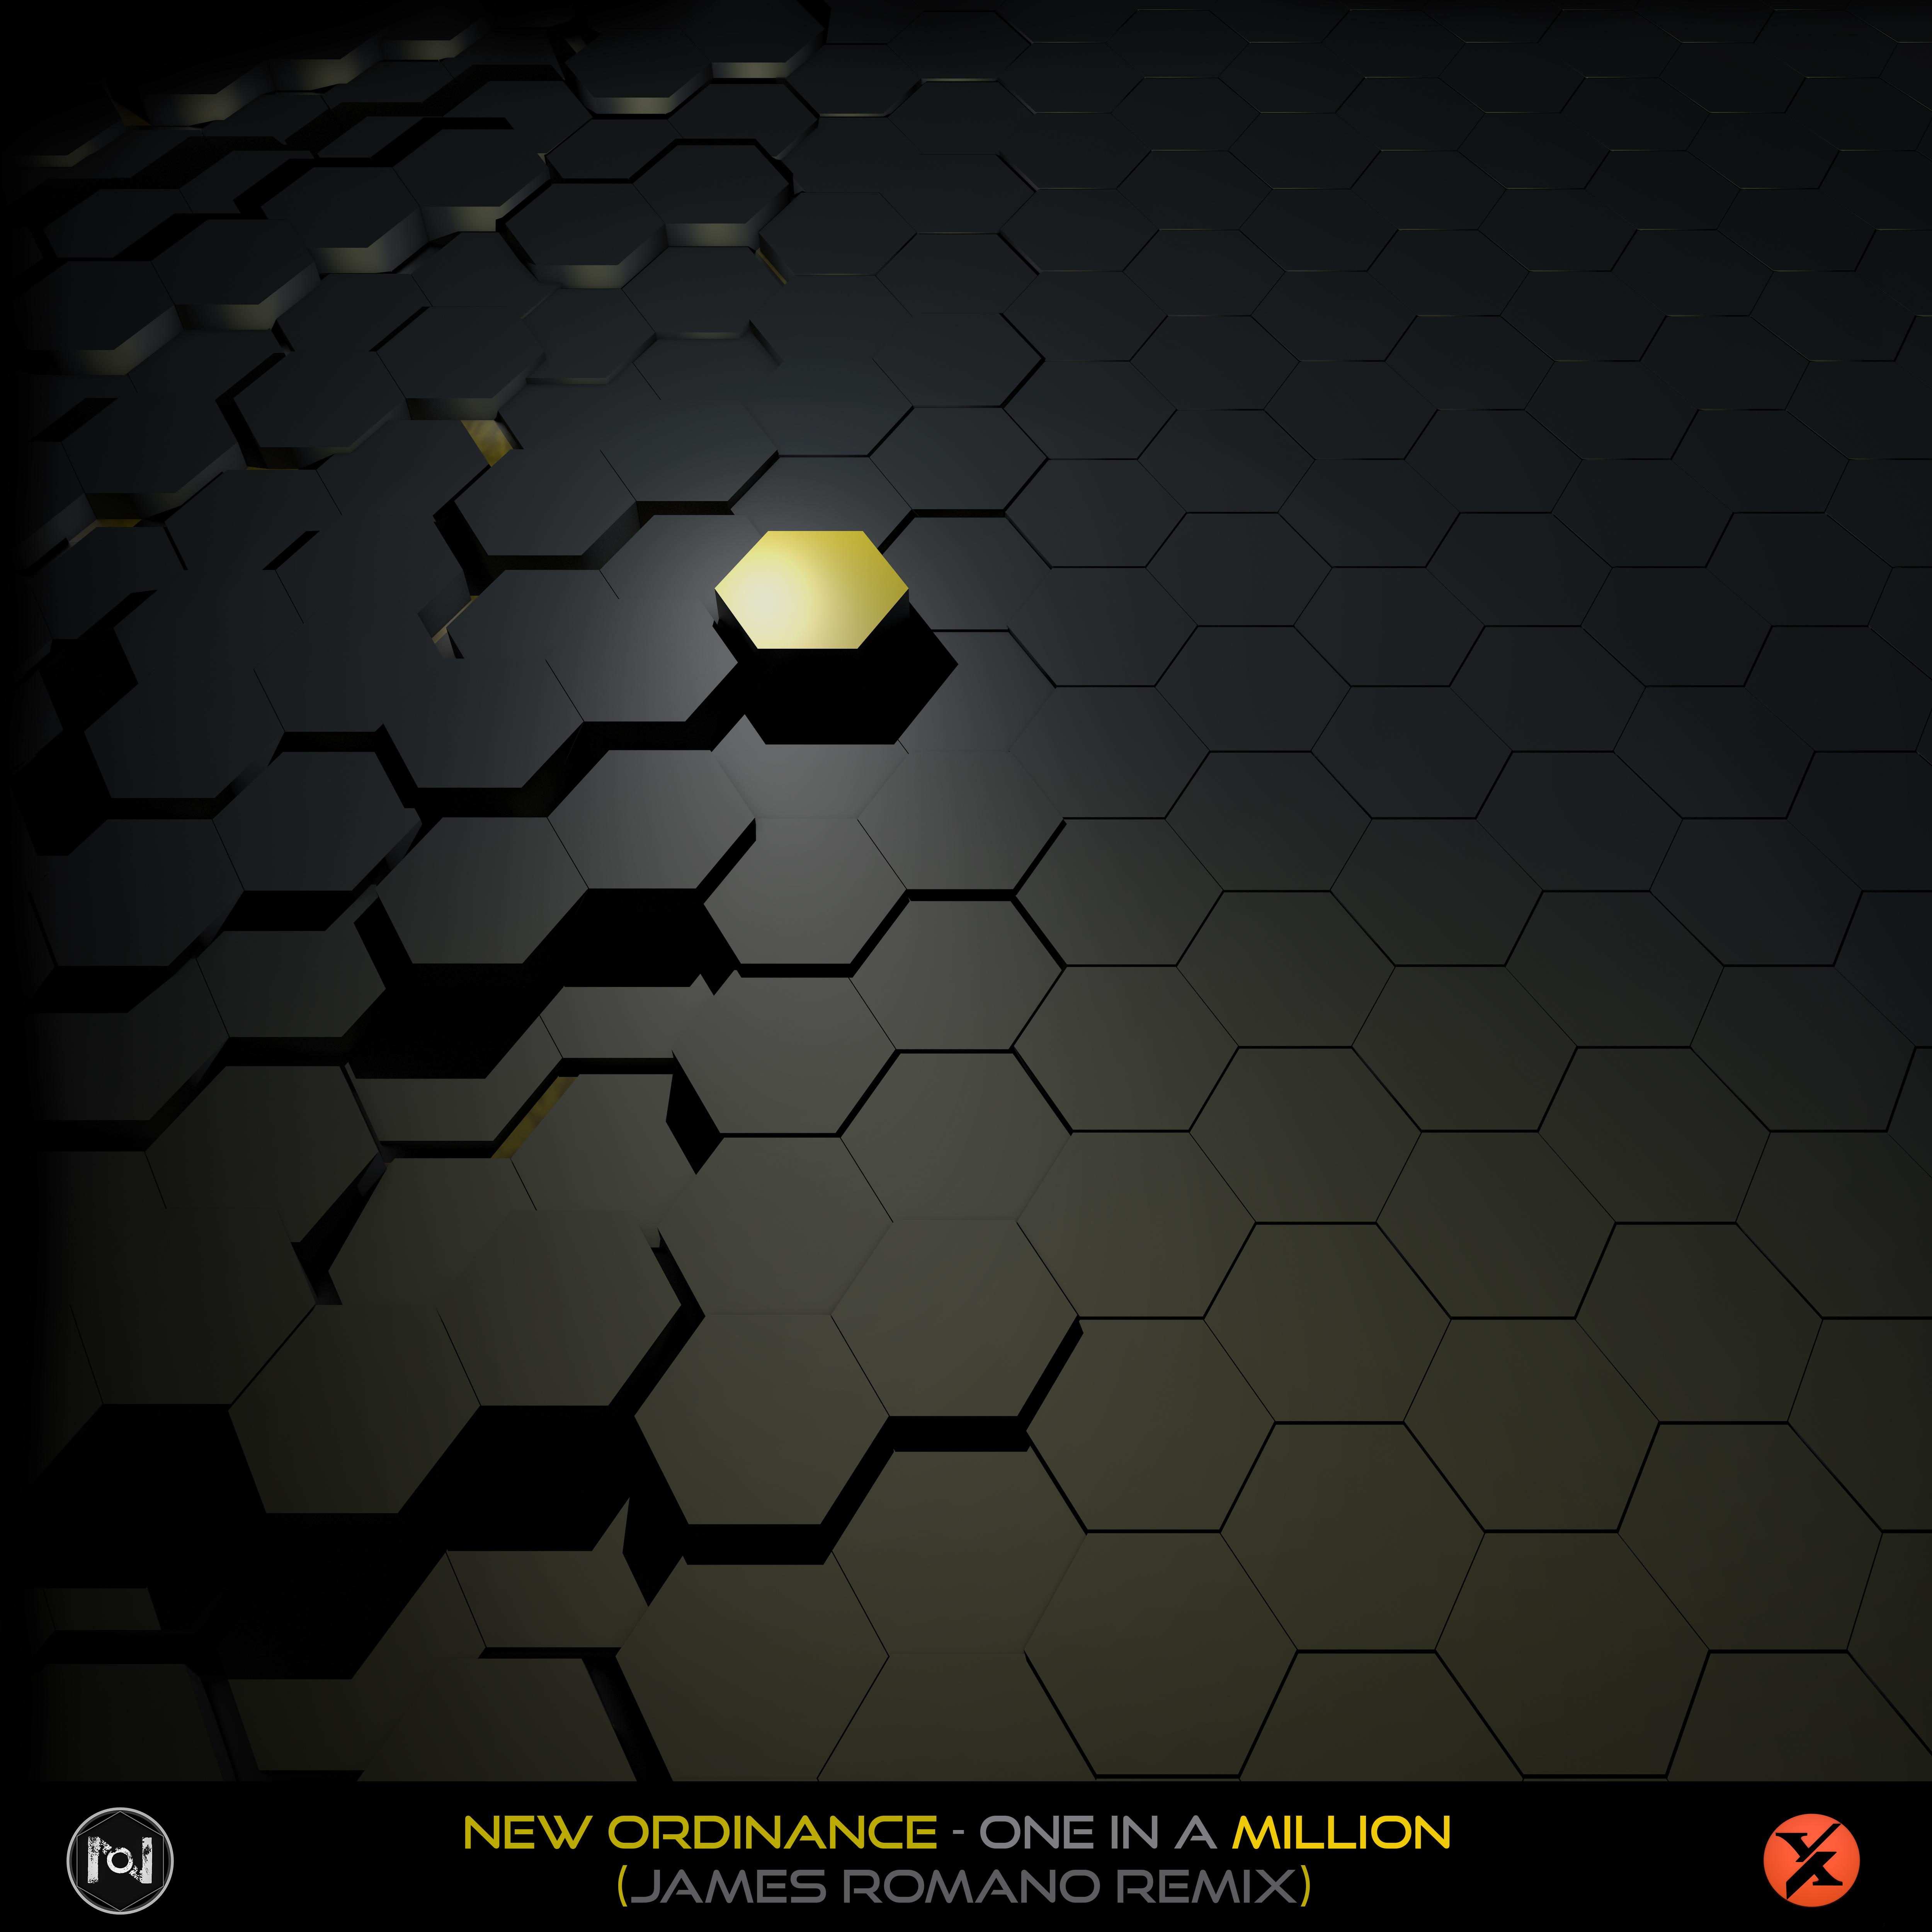 New Ordinance - One In A Million (James Romano Remix)